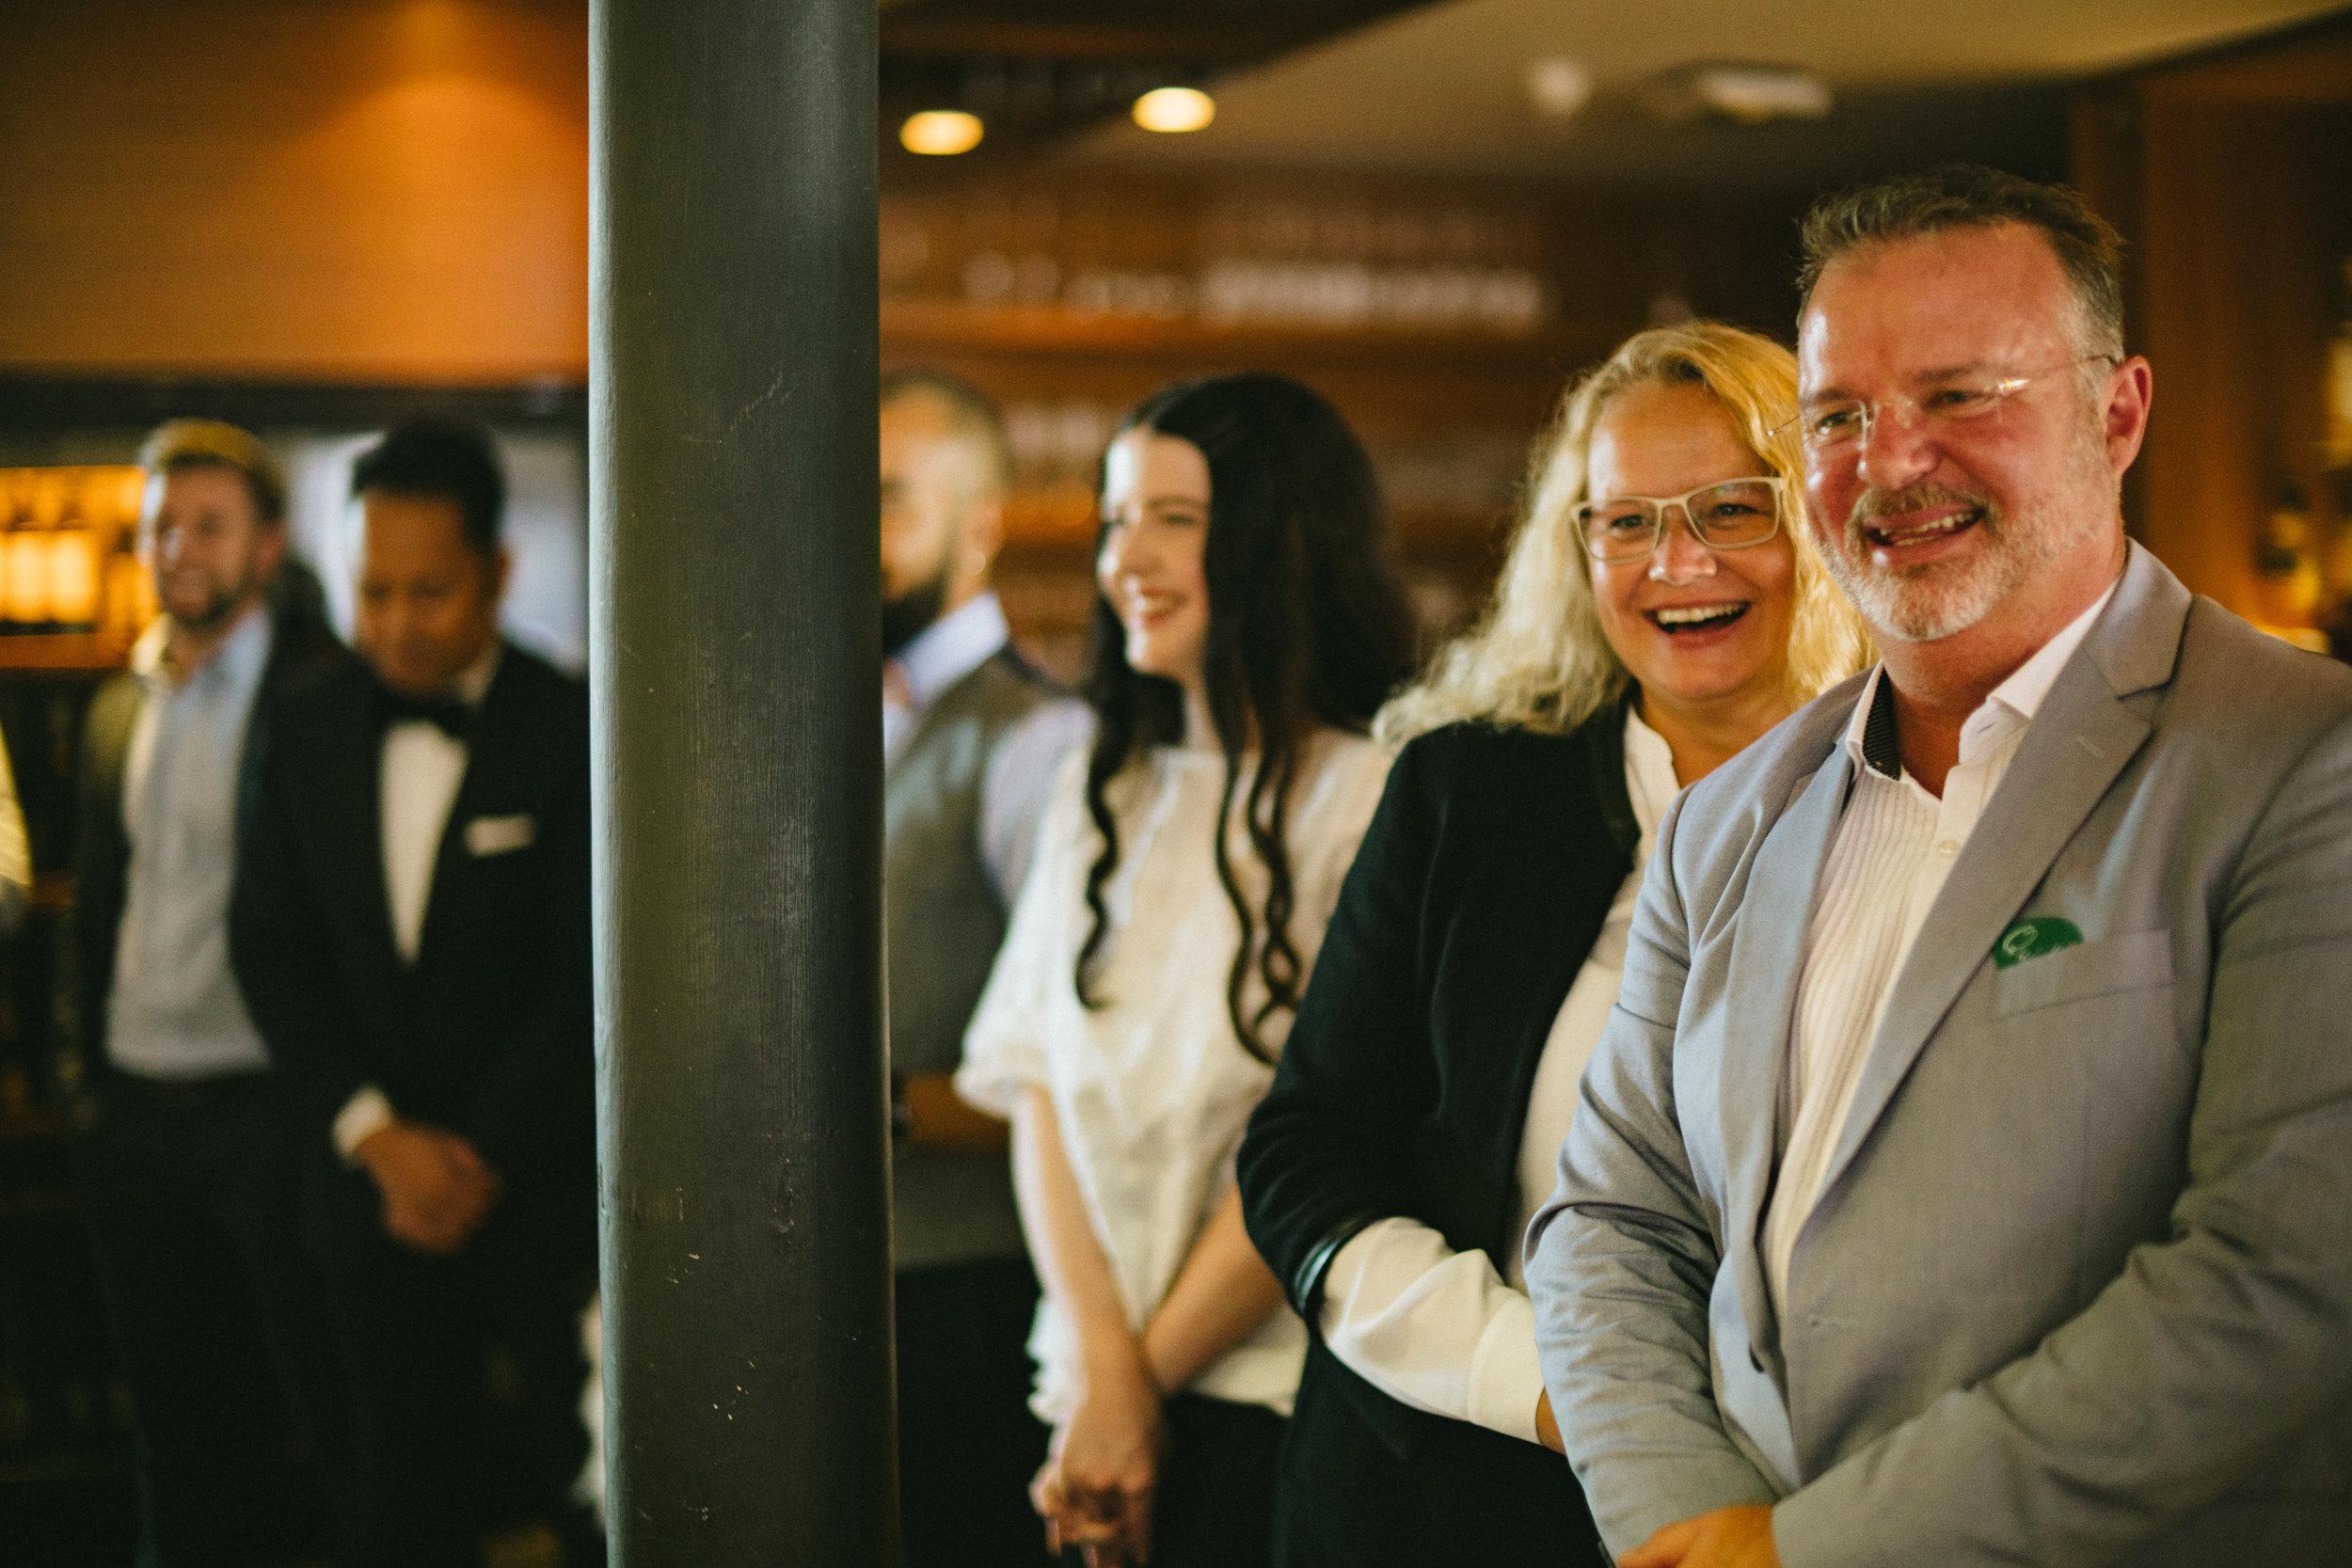 Malmo Sweden Wedding-Reception-RonaldJohanna-Cam4-94.jpg